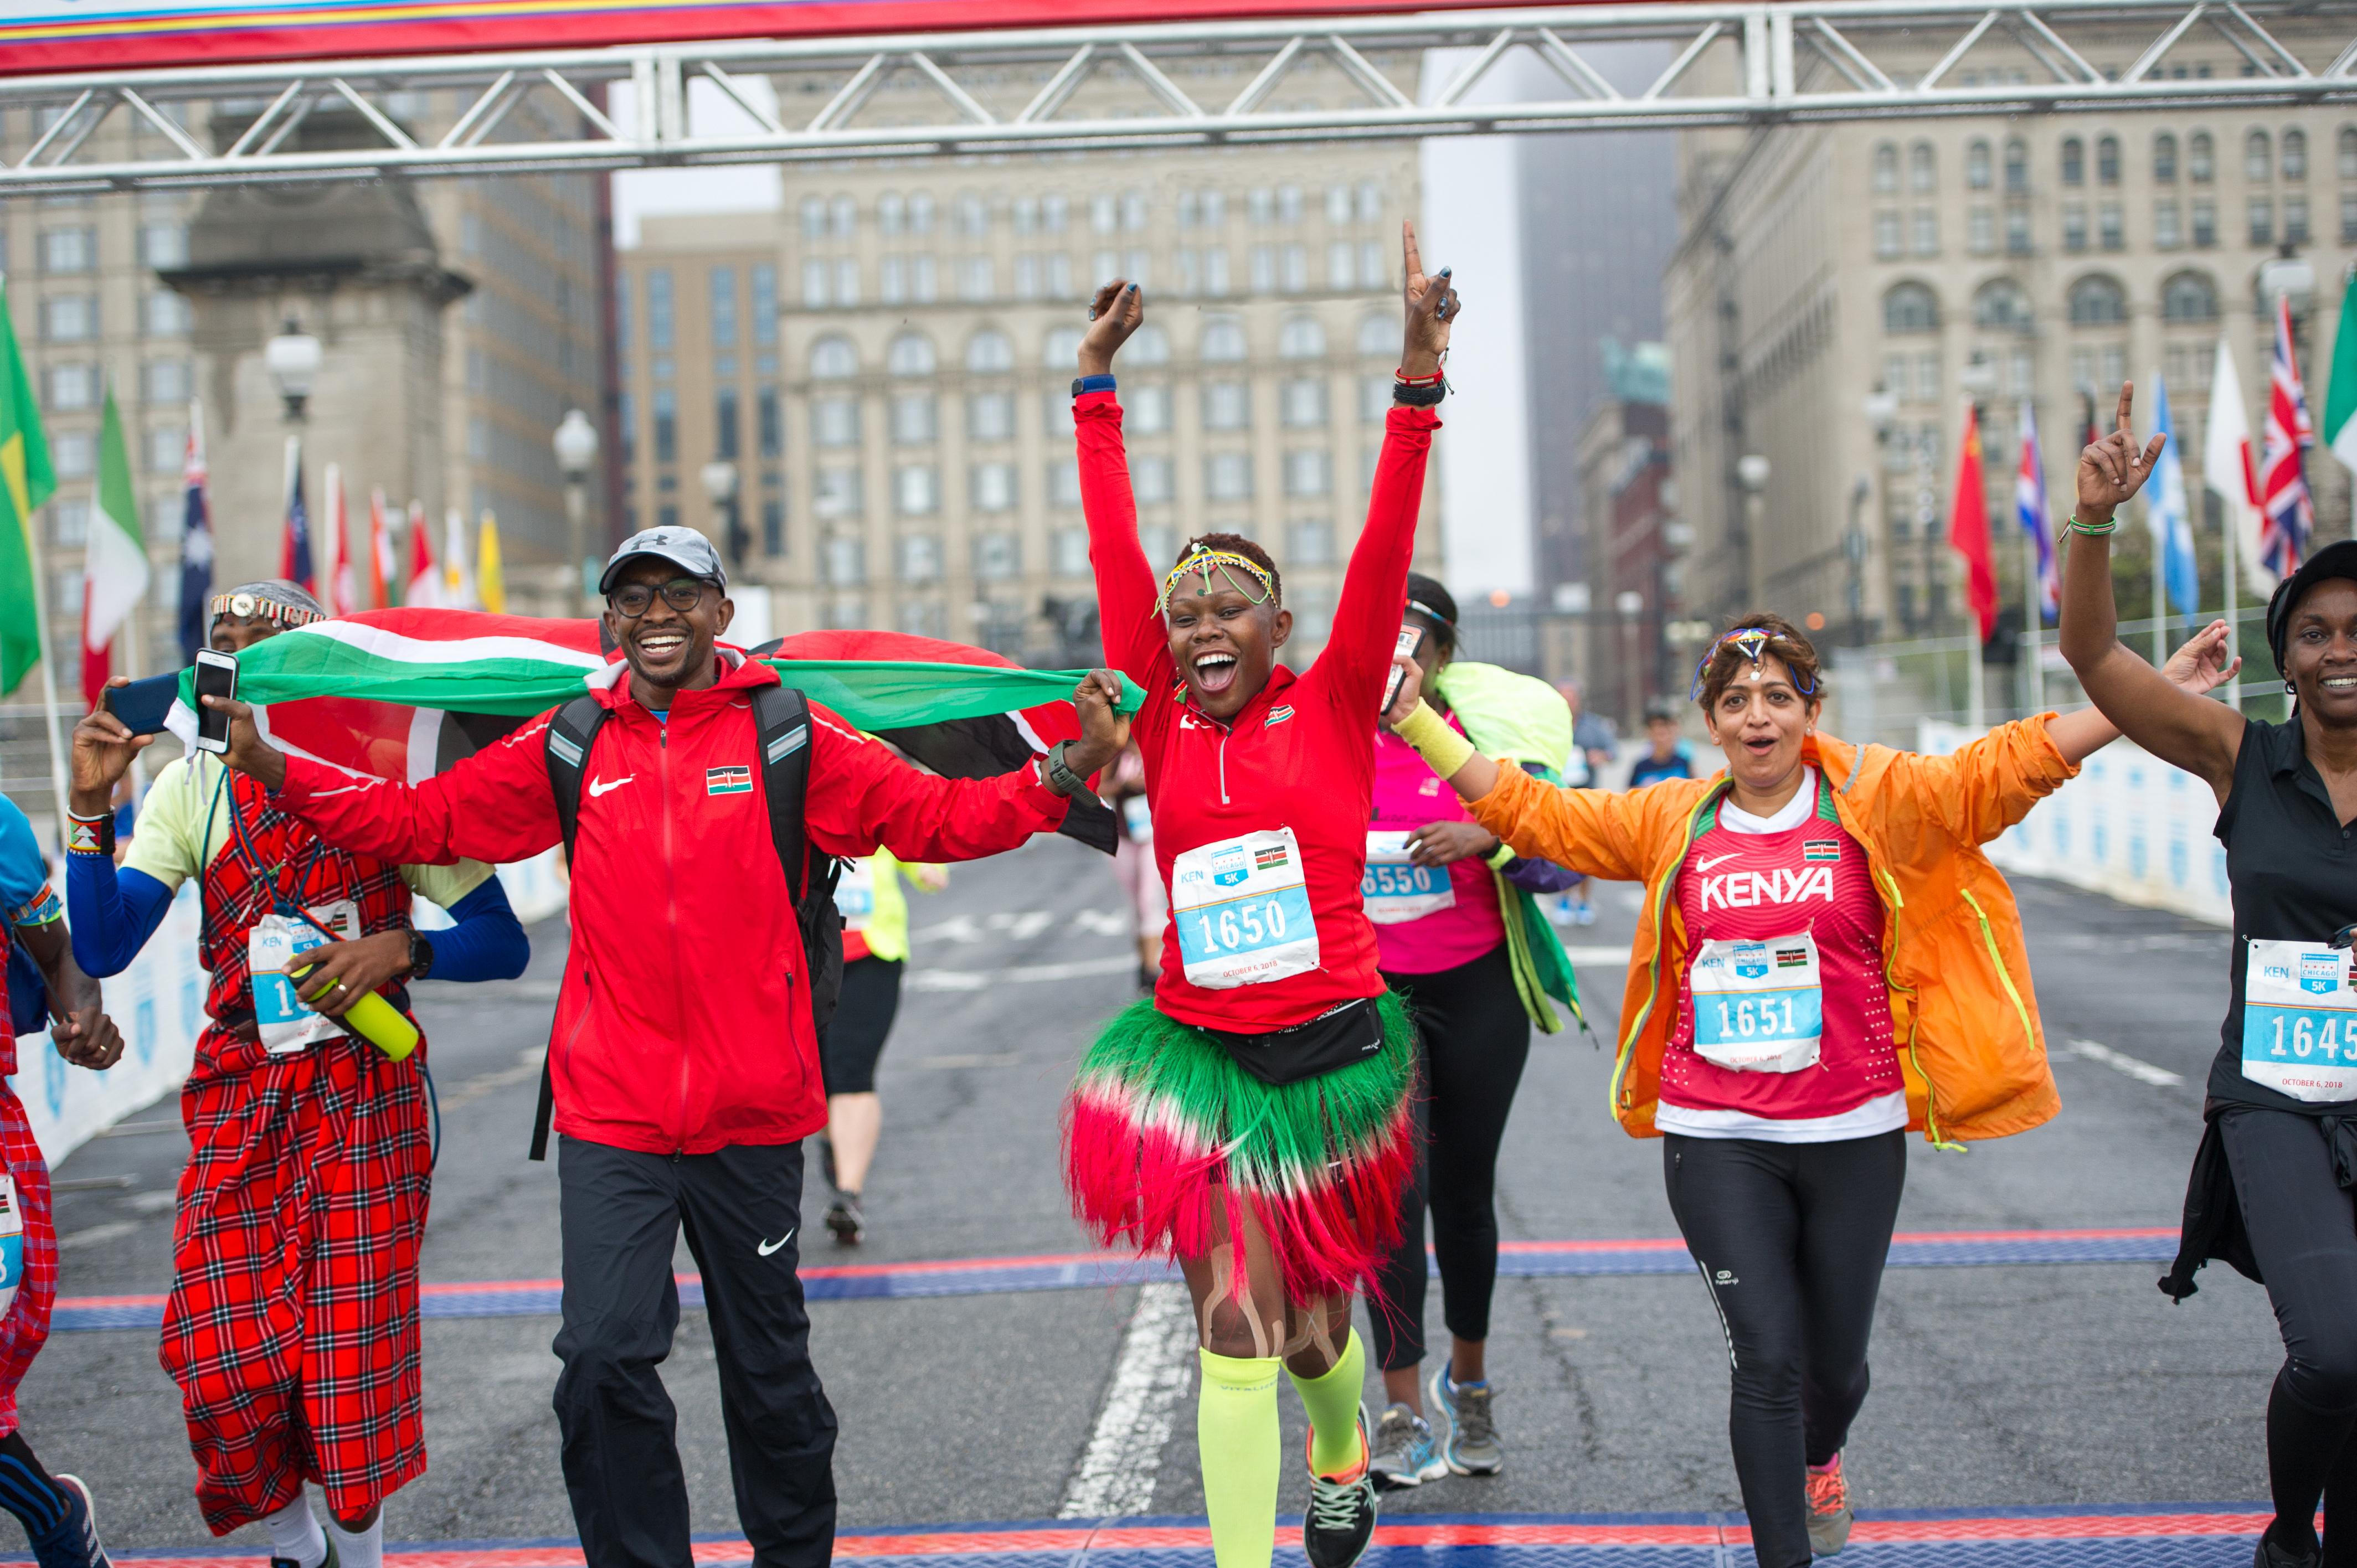 Run the Advocate Health Care International Chicago 5K